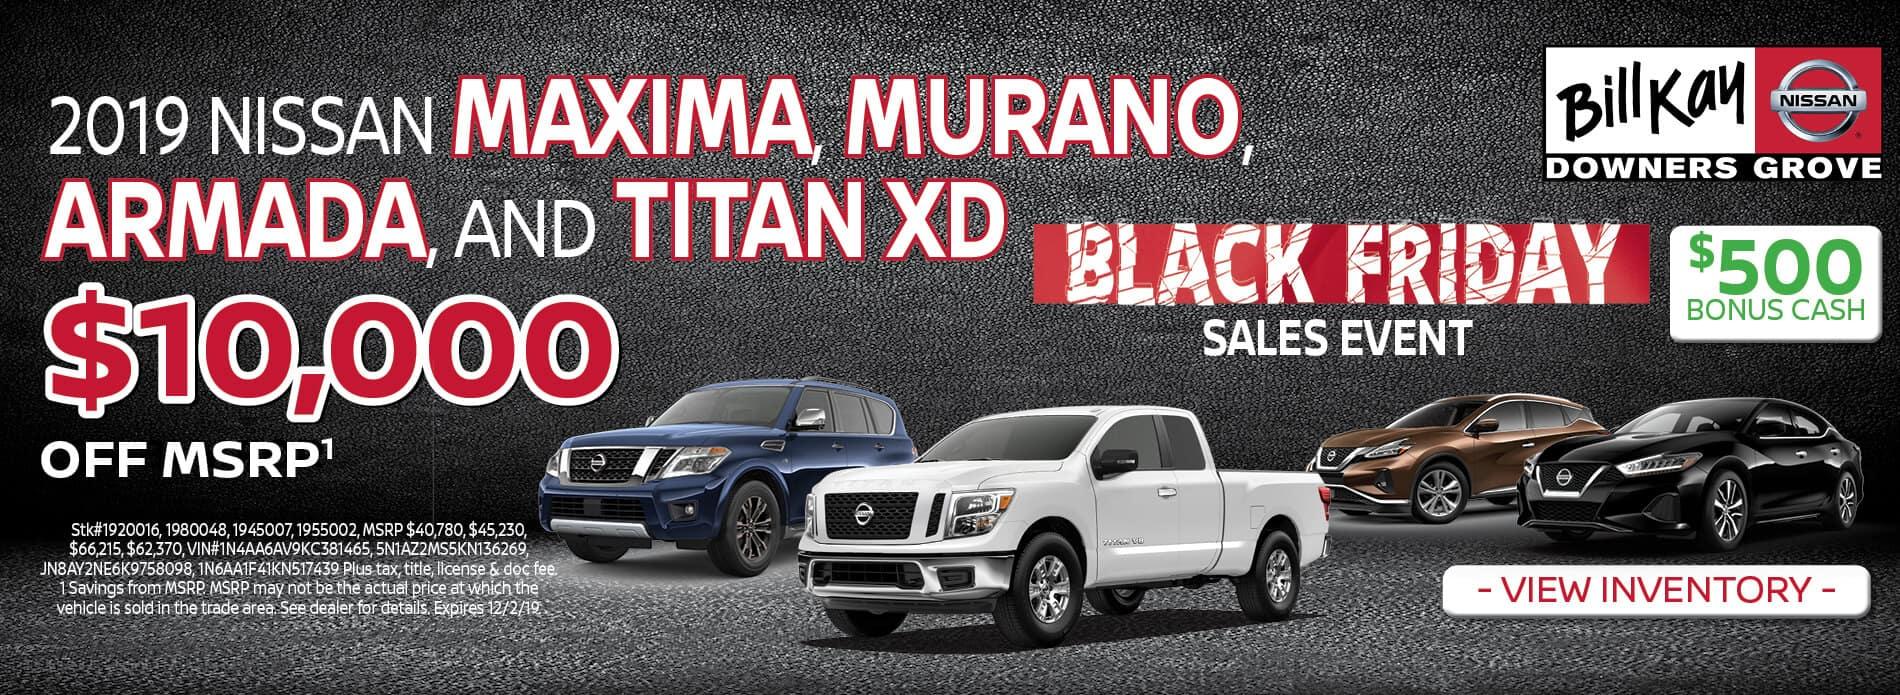 Nissan Dickson Tn >> Nissan Motors Acceptance - Wallpaperzen.org